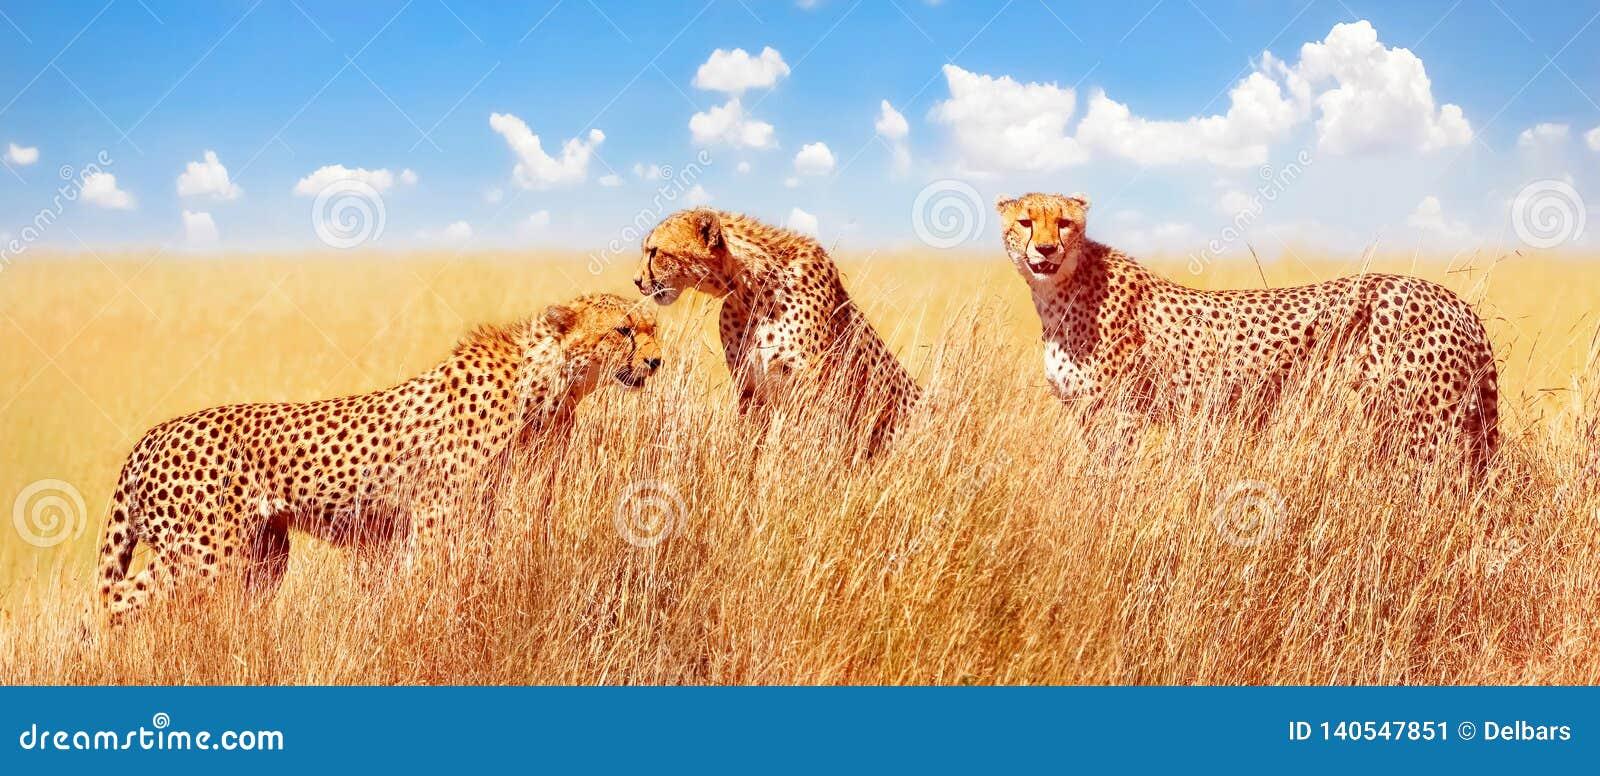 Grupo de guepardos en la sabana africana África, Tanzania, parque nacional de Serengeti